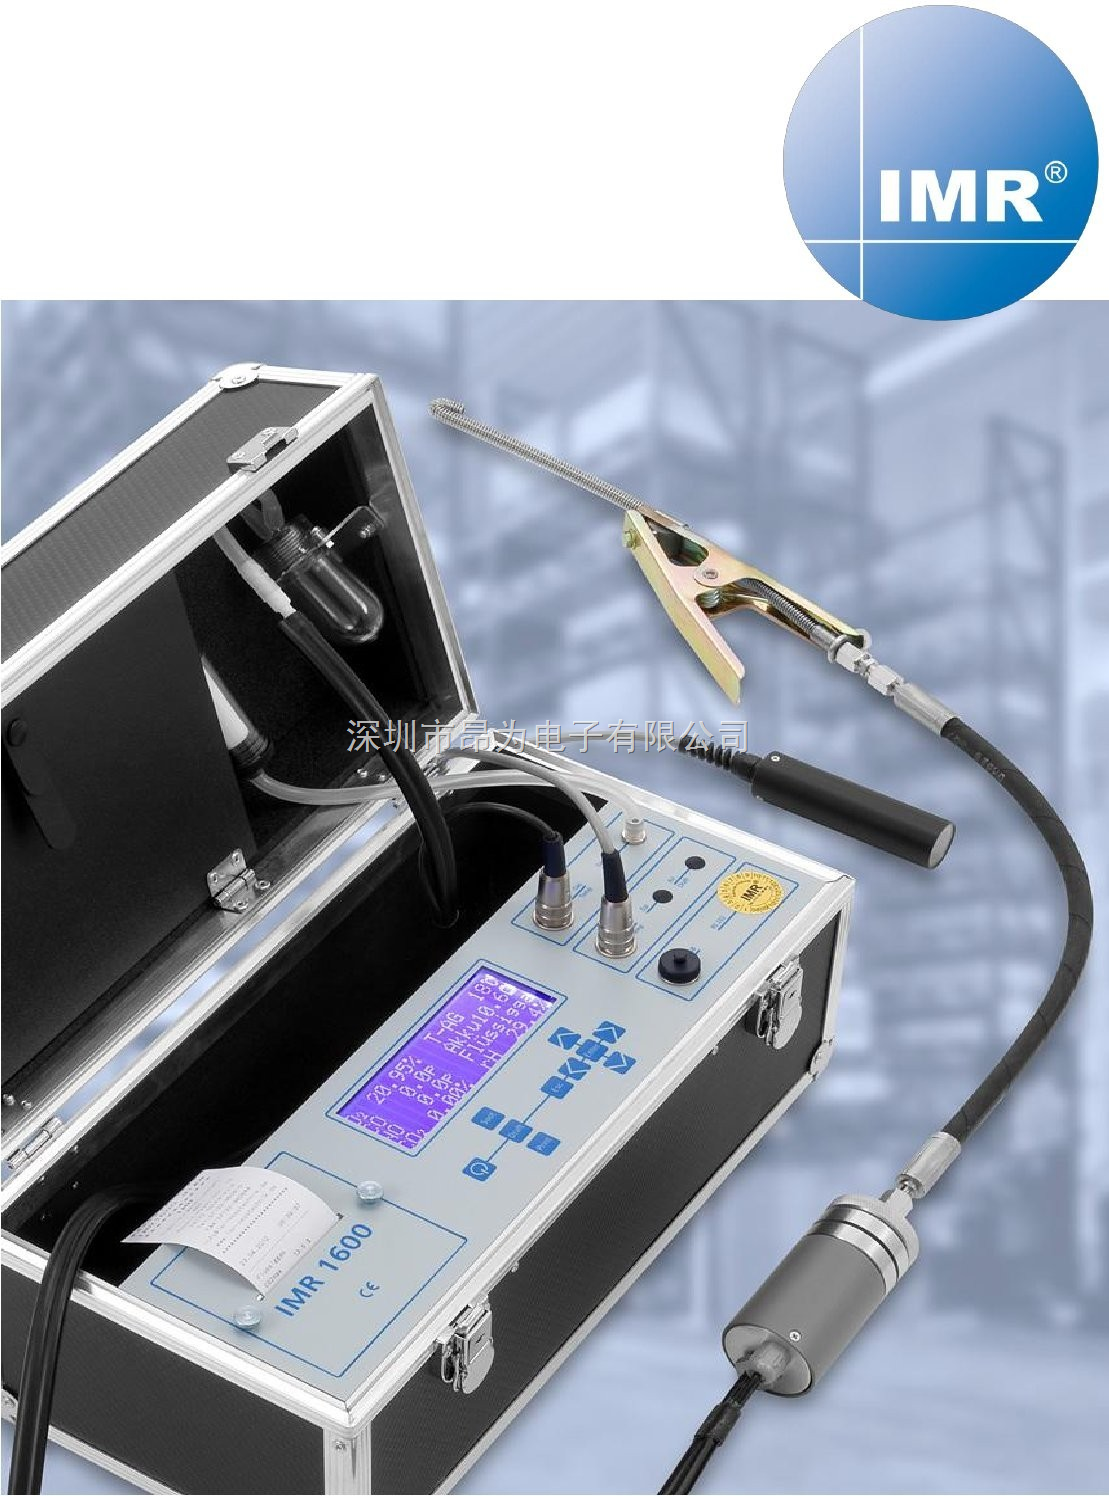 IMR 1600diga-便携式烟气分析仪IMR 1600diga